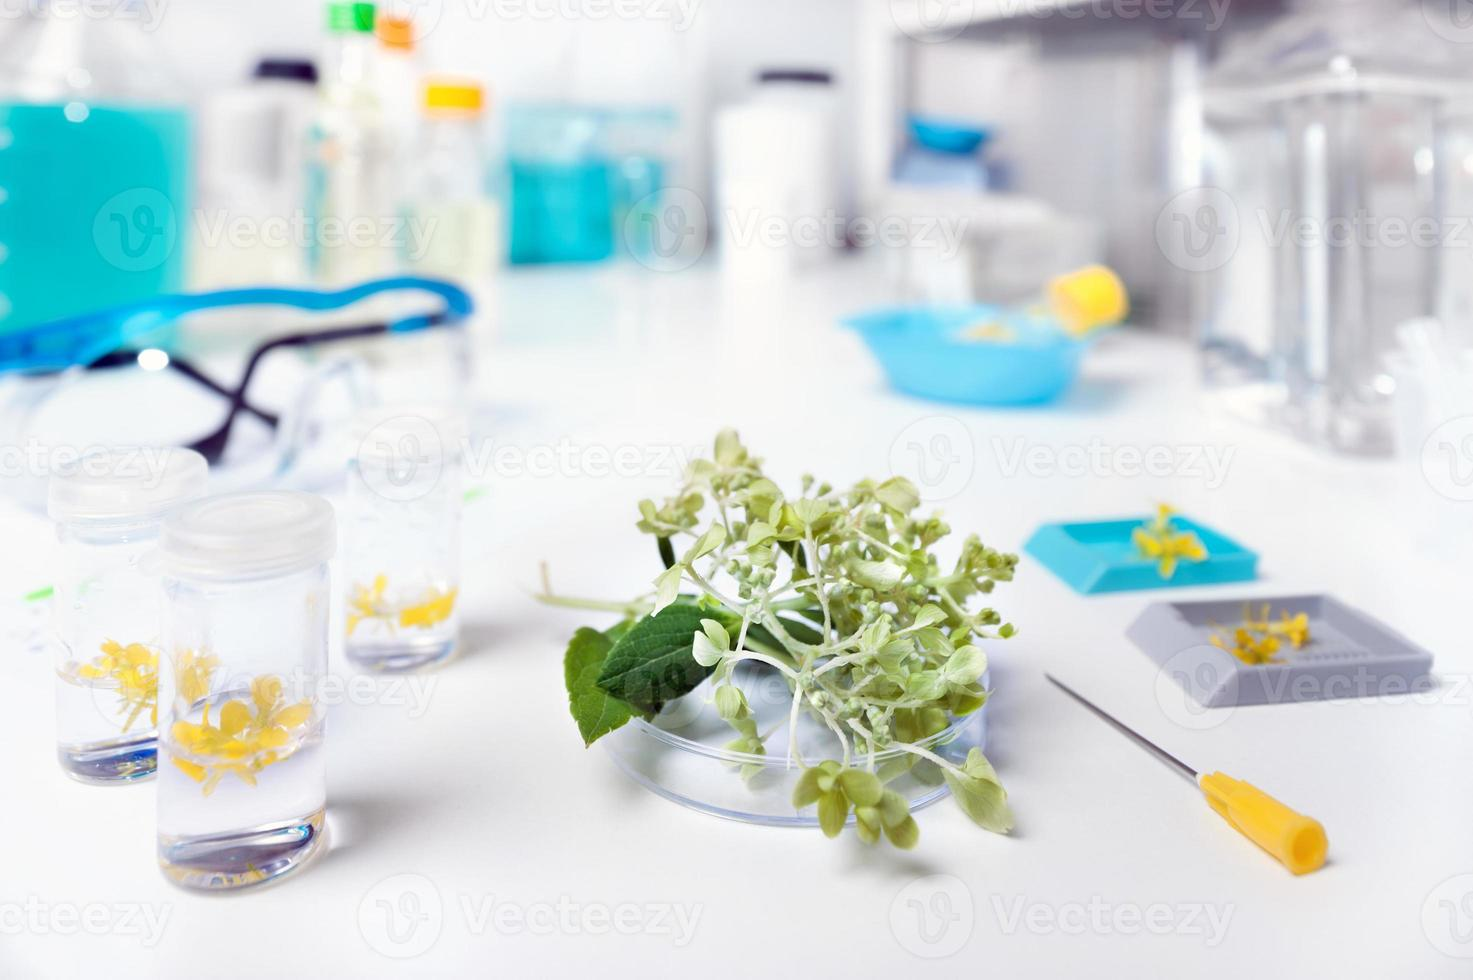 plantenbiologie foto